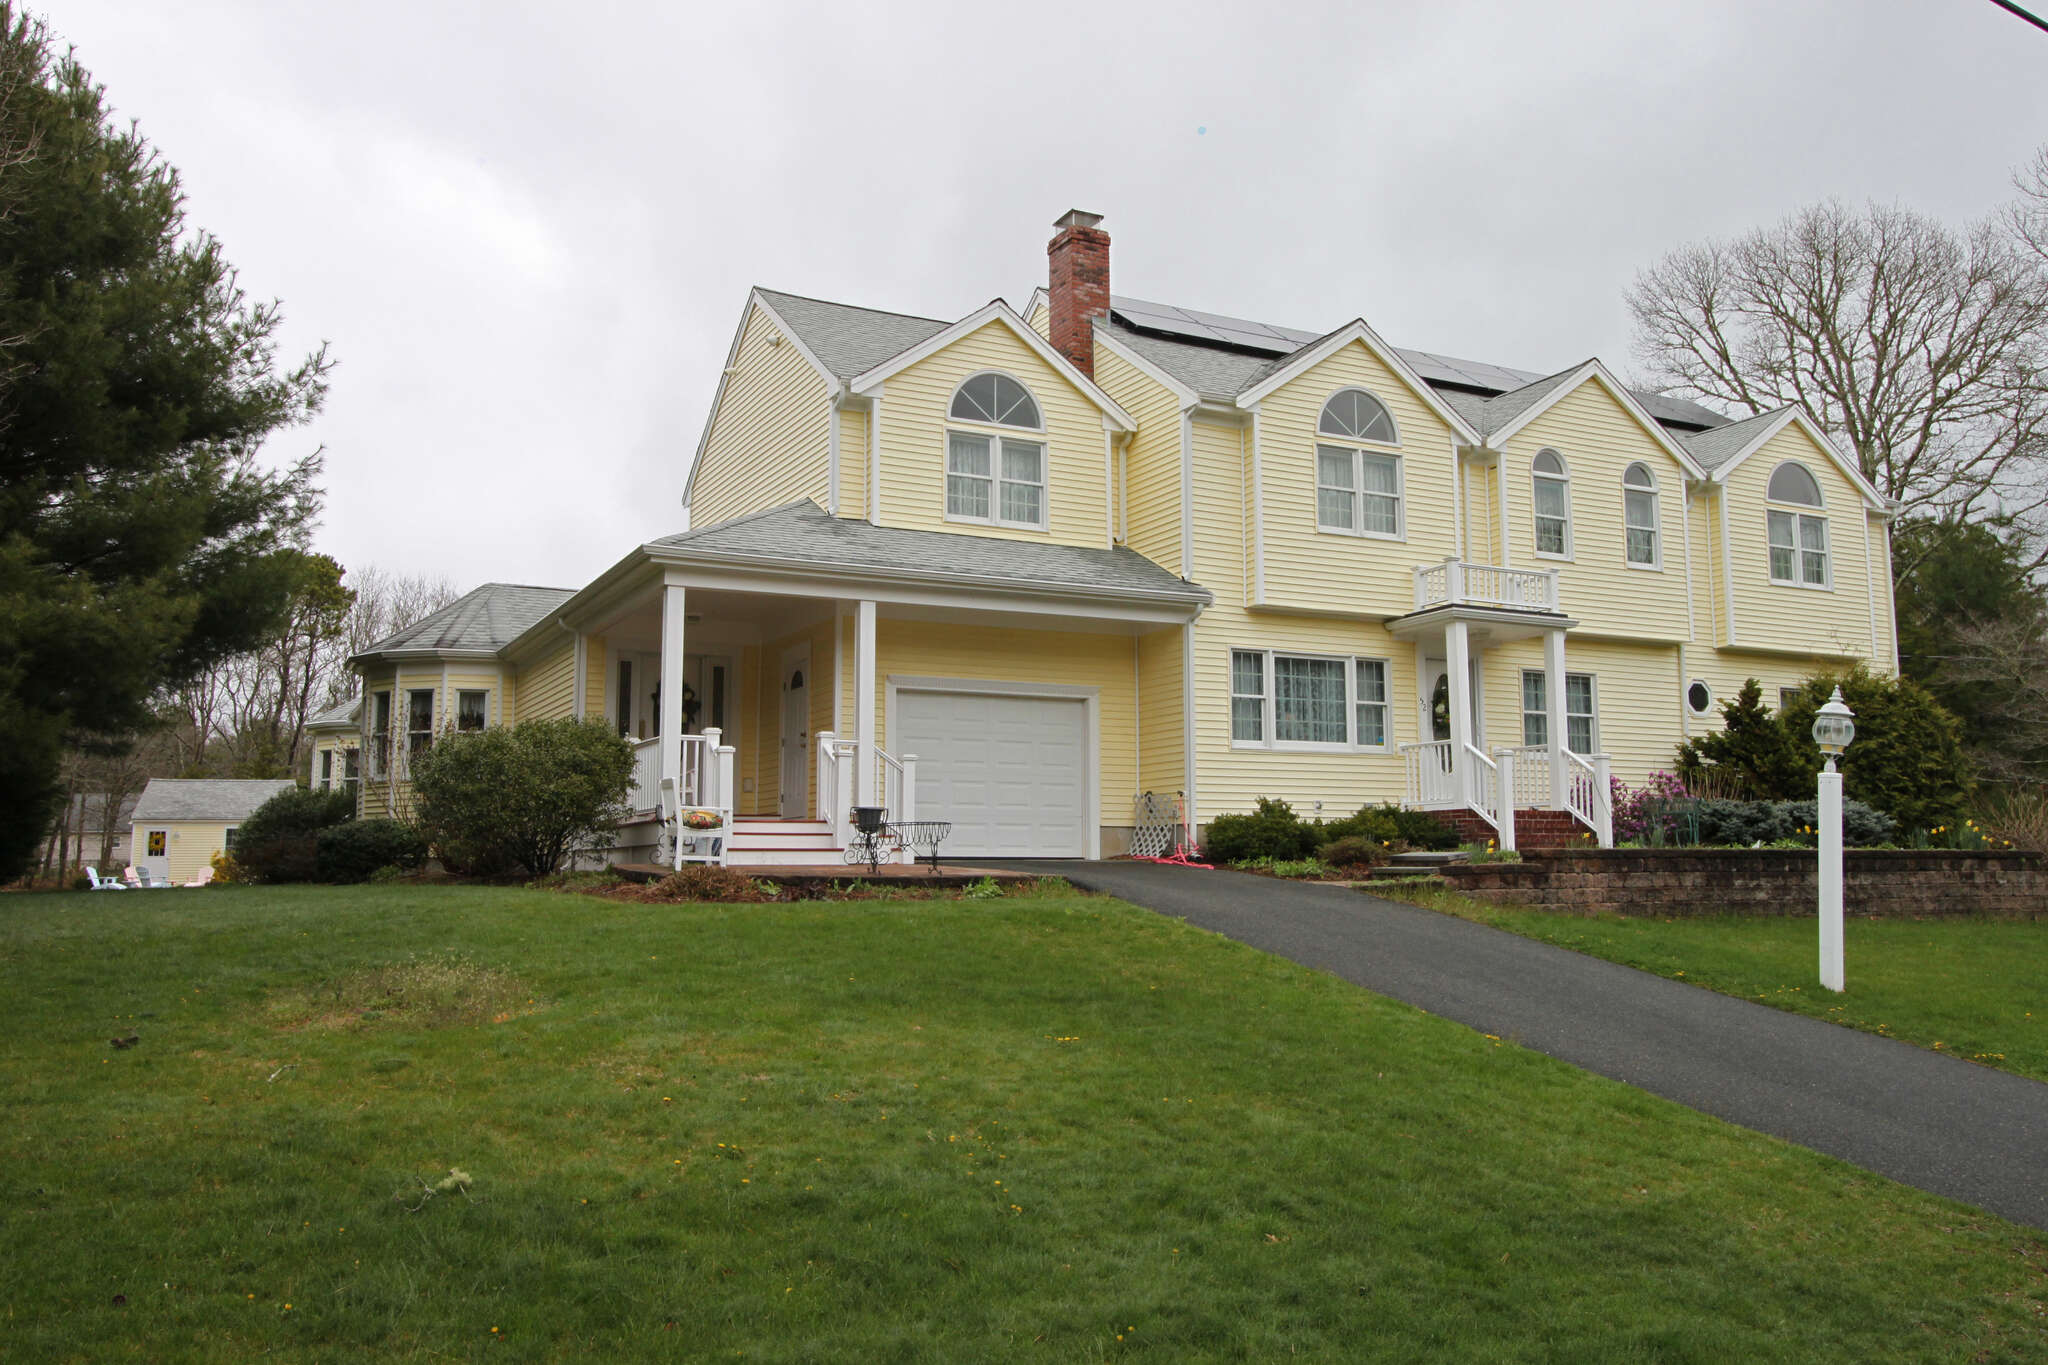 Single Family for Sale at 52 Lovells Road Cotuit, Massachusetts 02635 United States